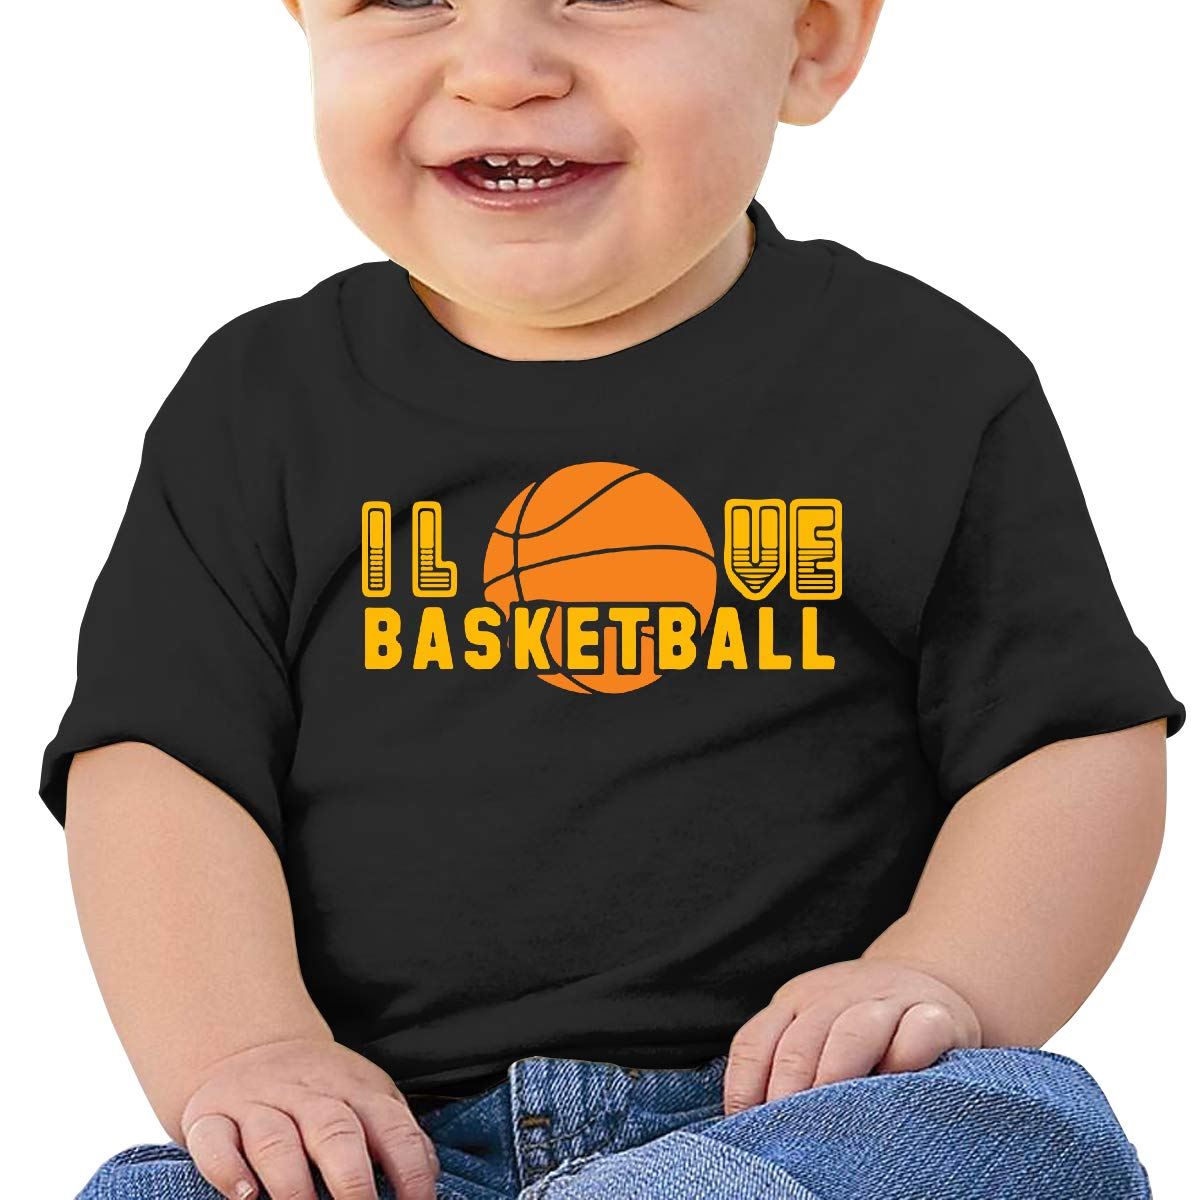 I Love Basketball Newborn Baby Newborn Short Sleeve T-Shirt 6-24 Month Soft Tops